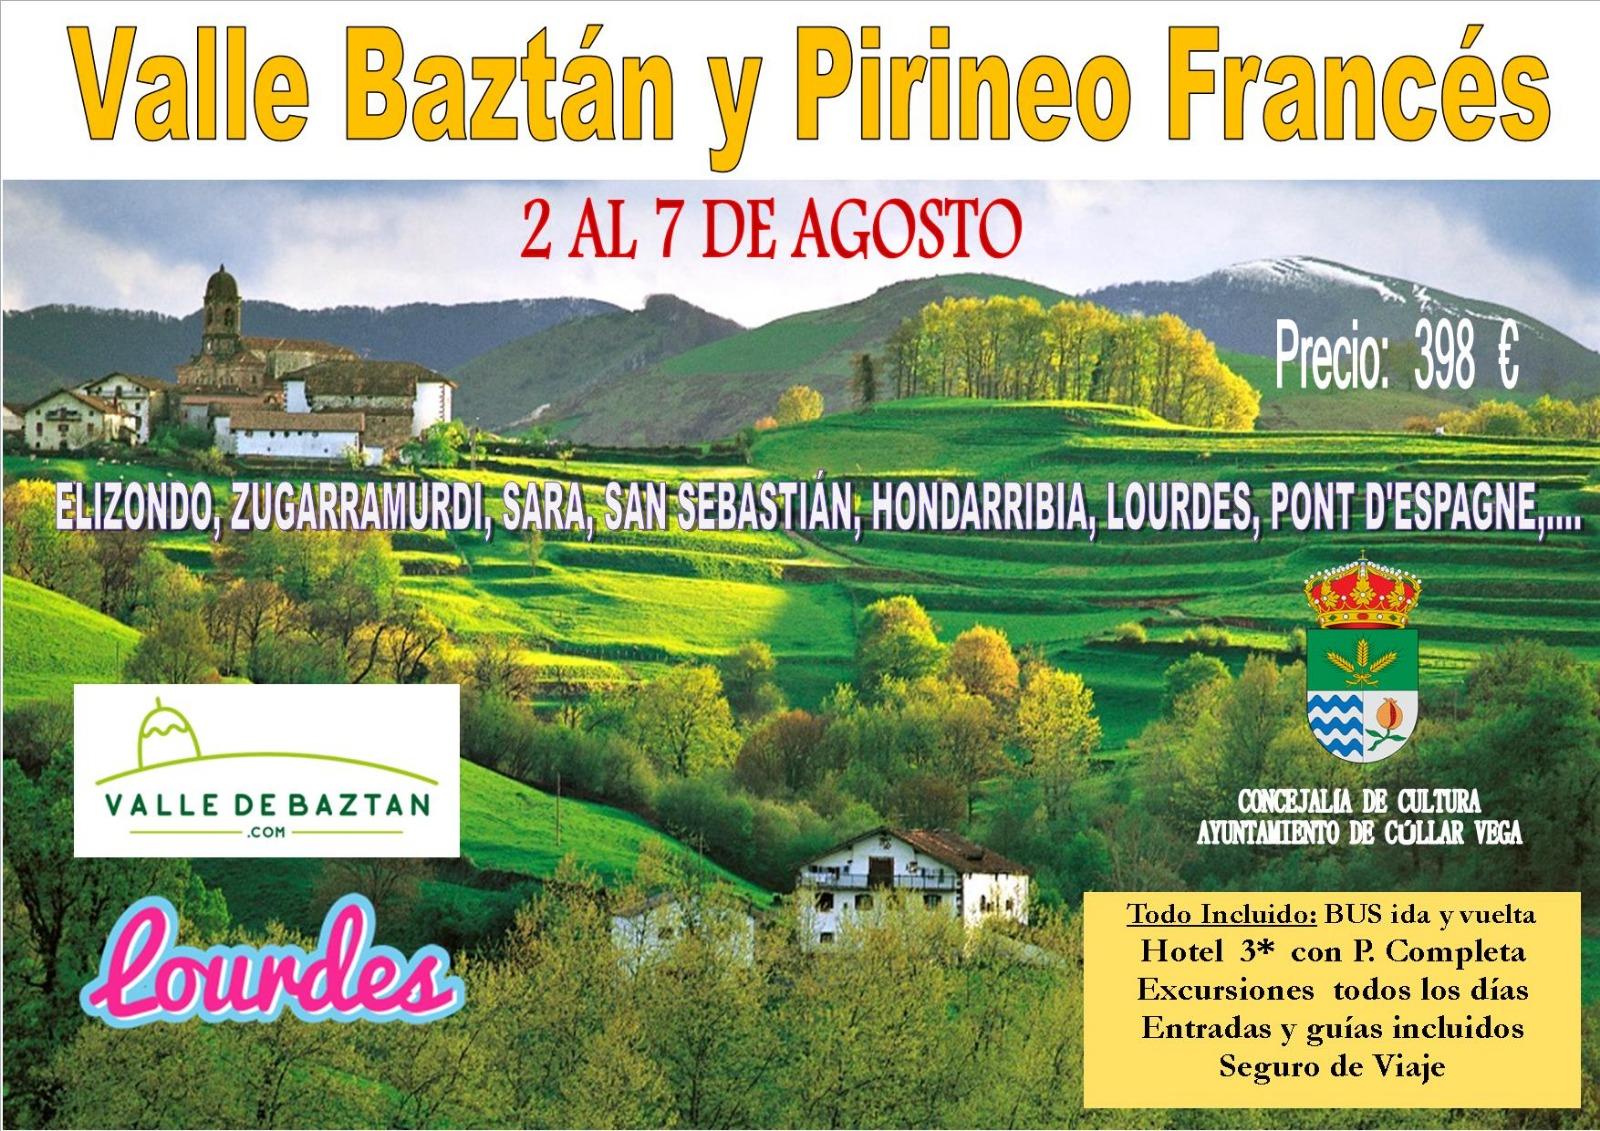 Viaje al Valle Baztán y Pirineo Fránces